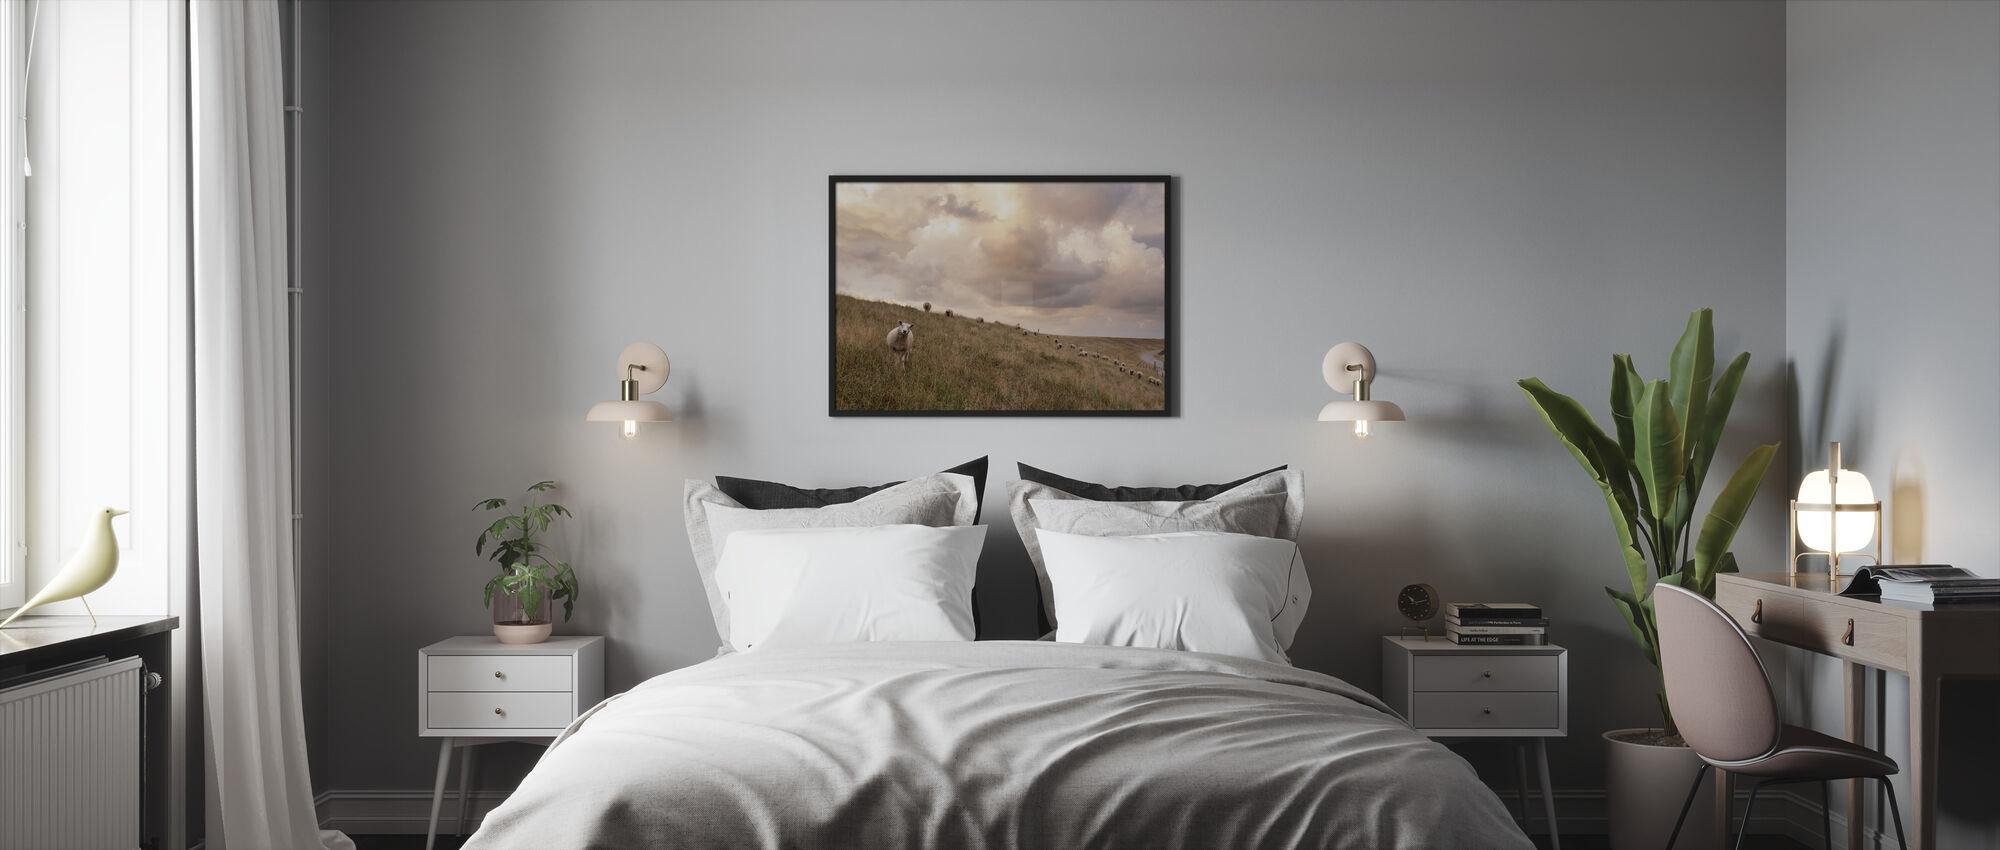 Attentive Sheep - Framed print - Bedroom